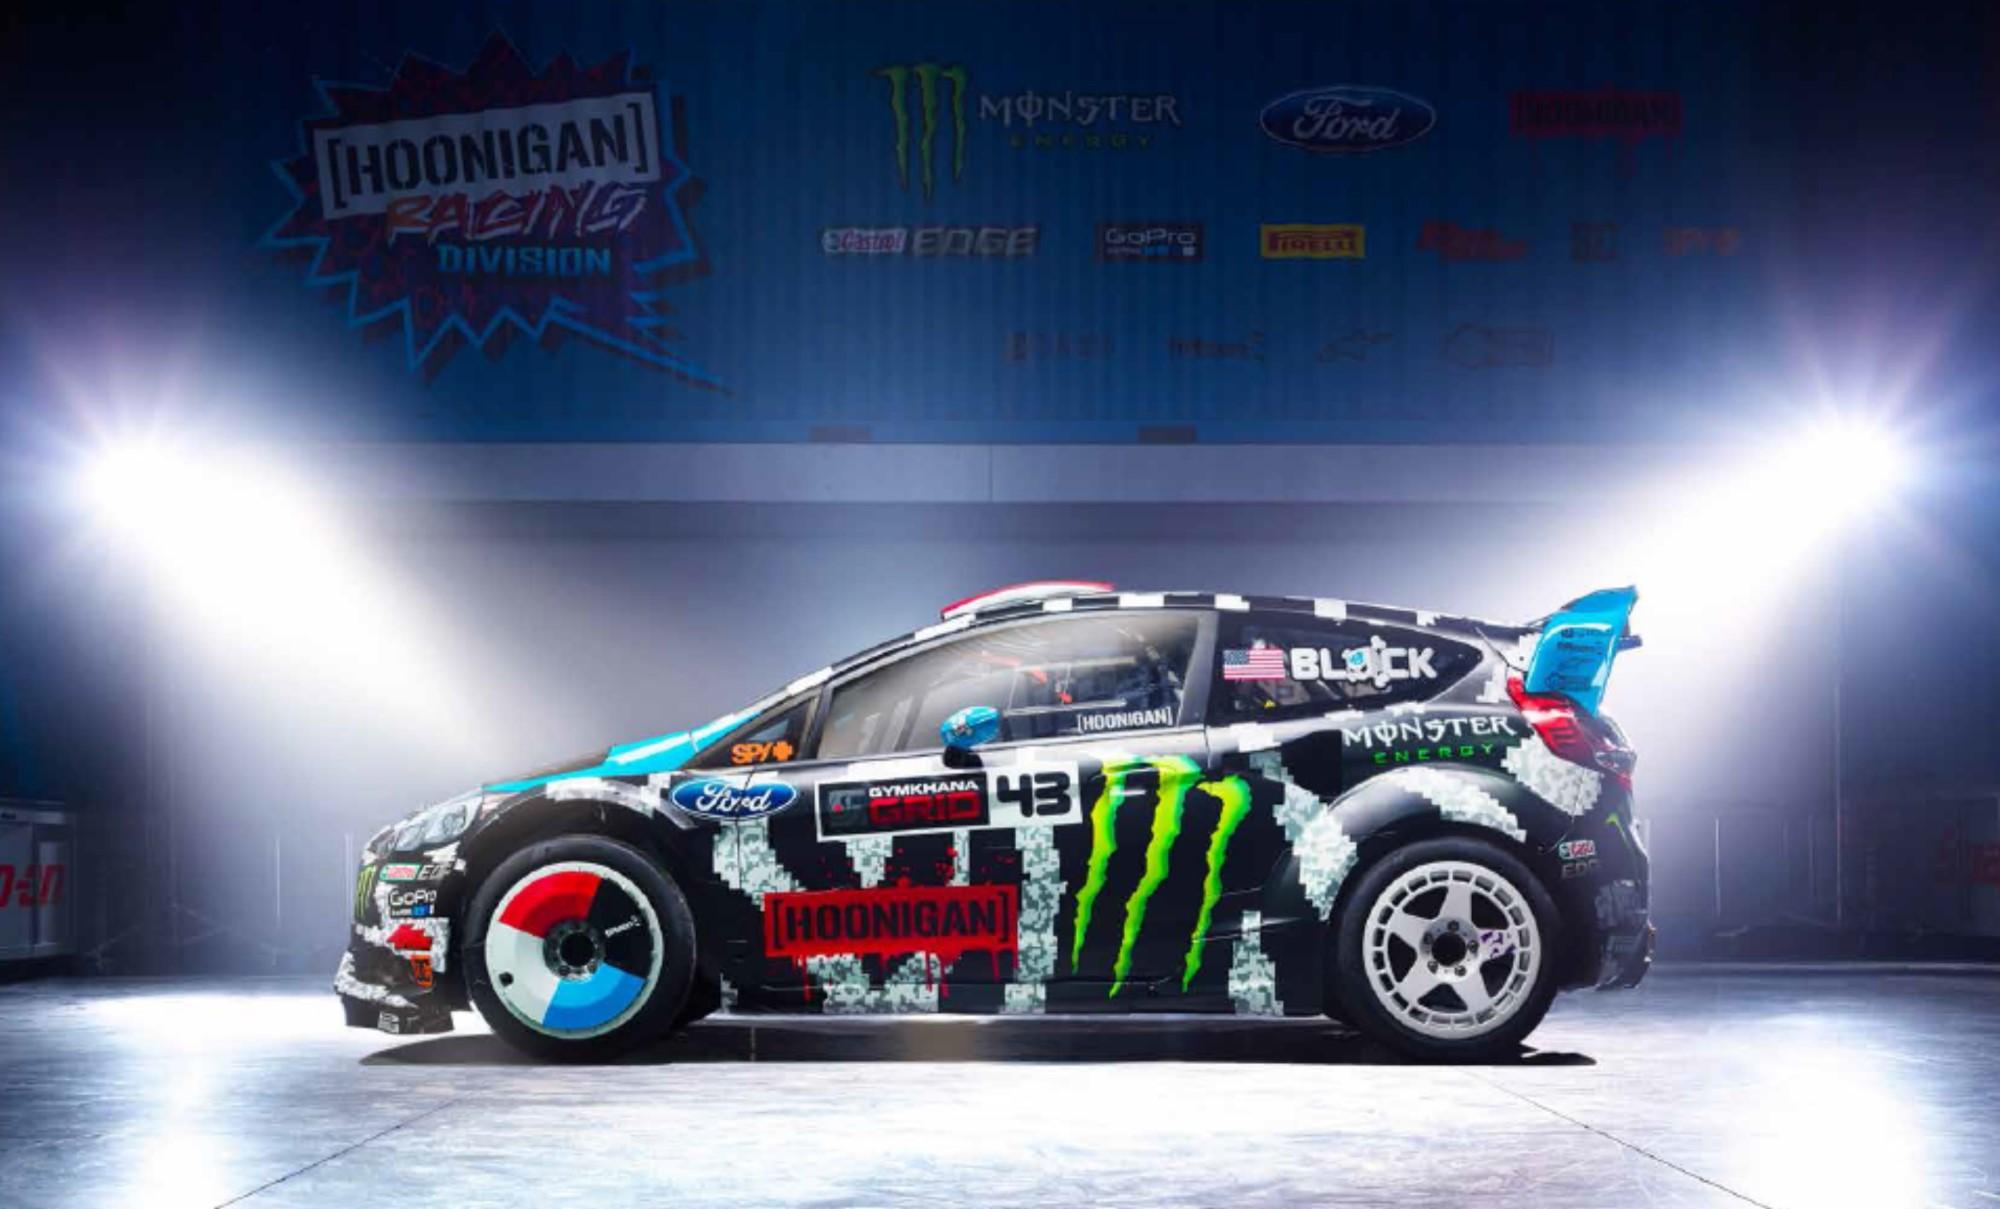 Ken Block Joins FIA World Rallycross